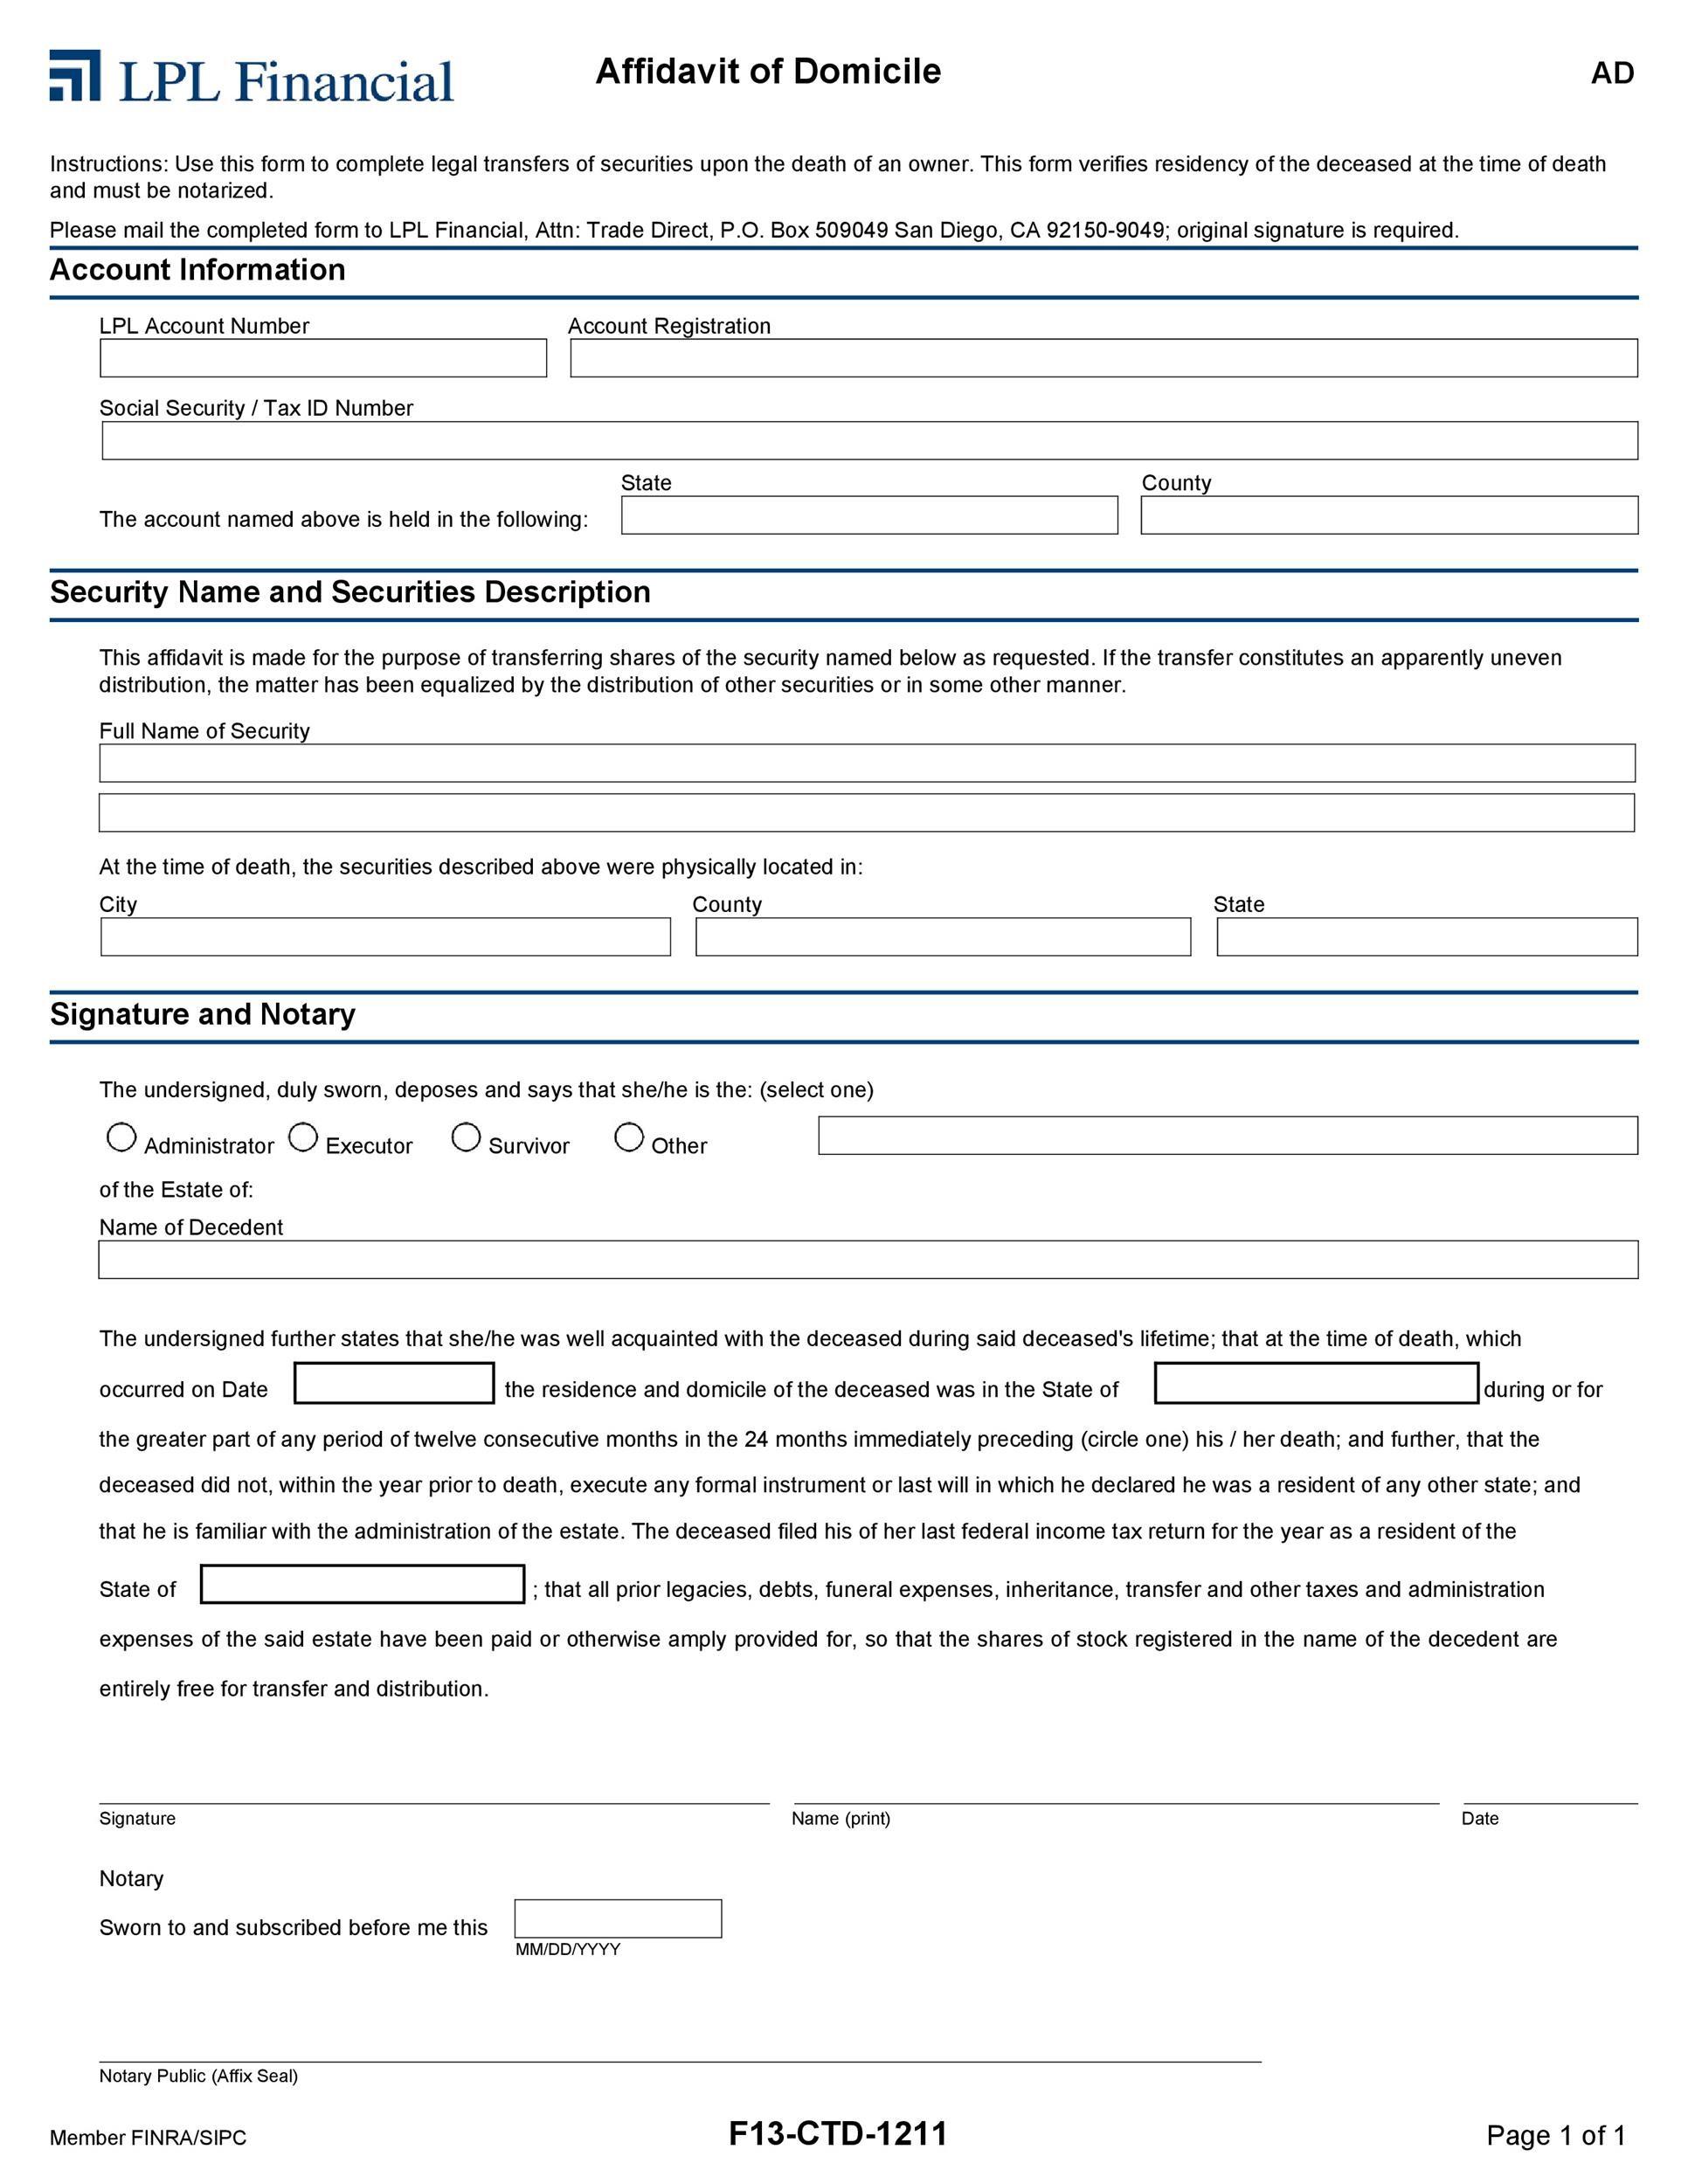 Free affidavit of domicile 05